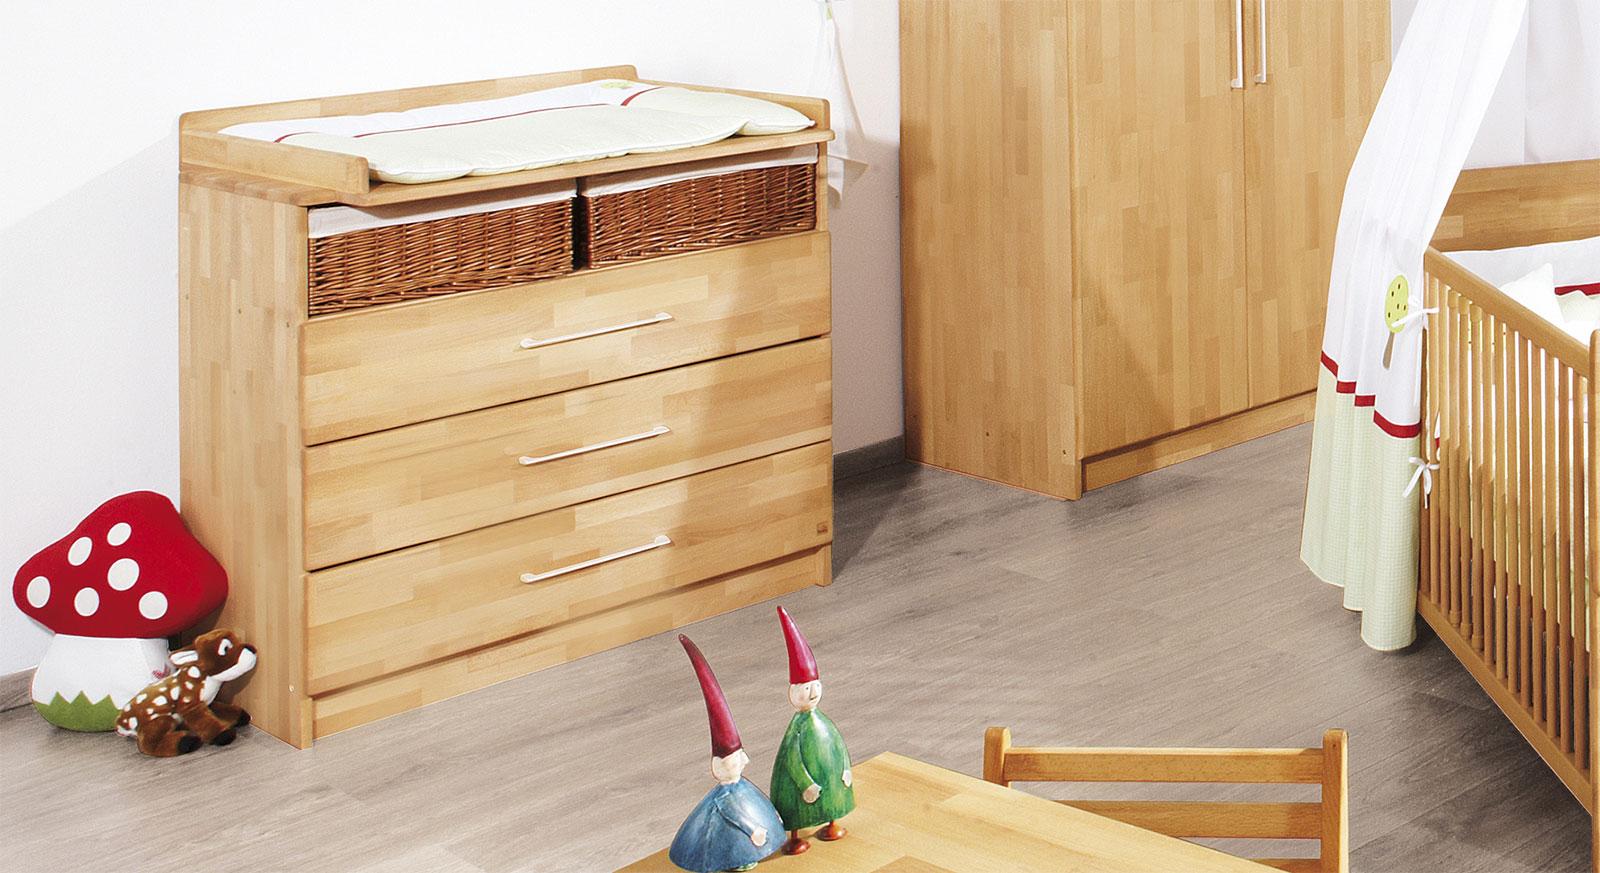 massivholz wickelkommode in ge ltem buchenholz natura. Black Bedroom Furniture Sets. Home Design Ideas